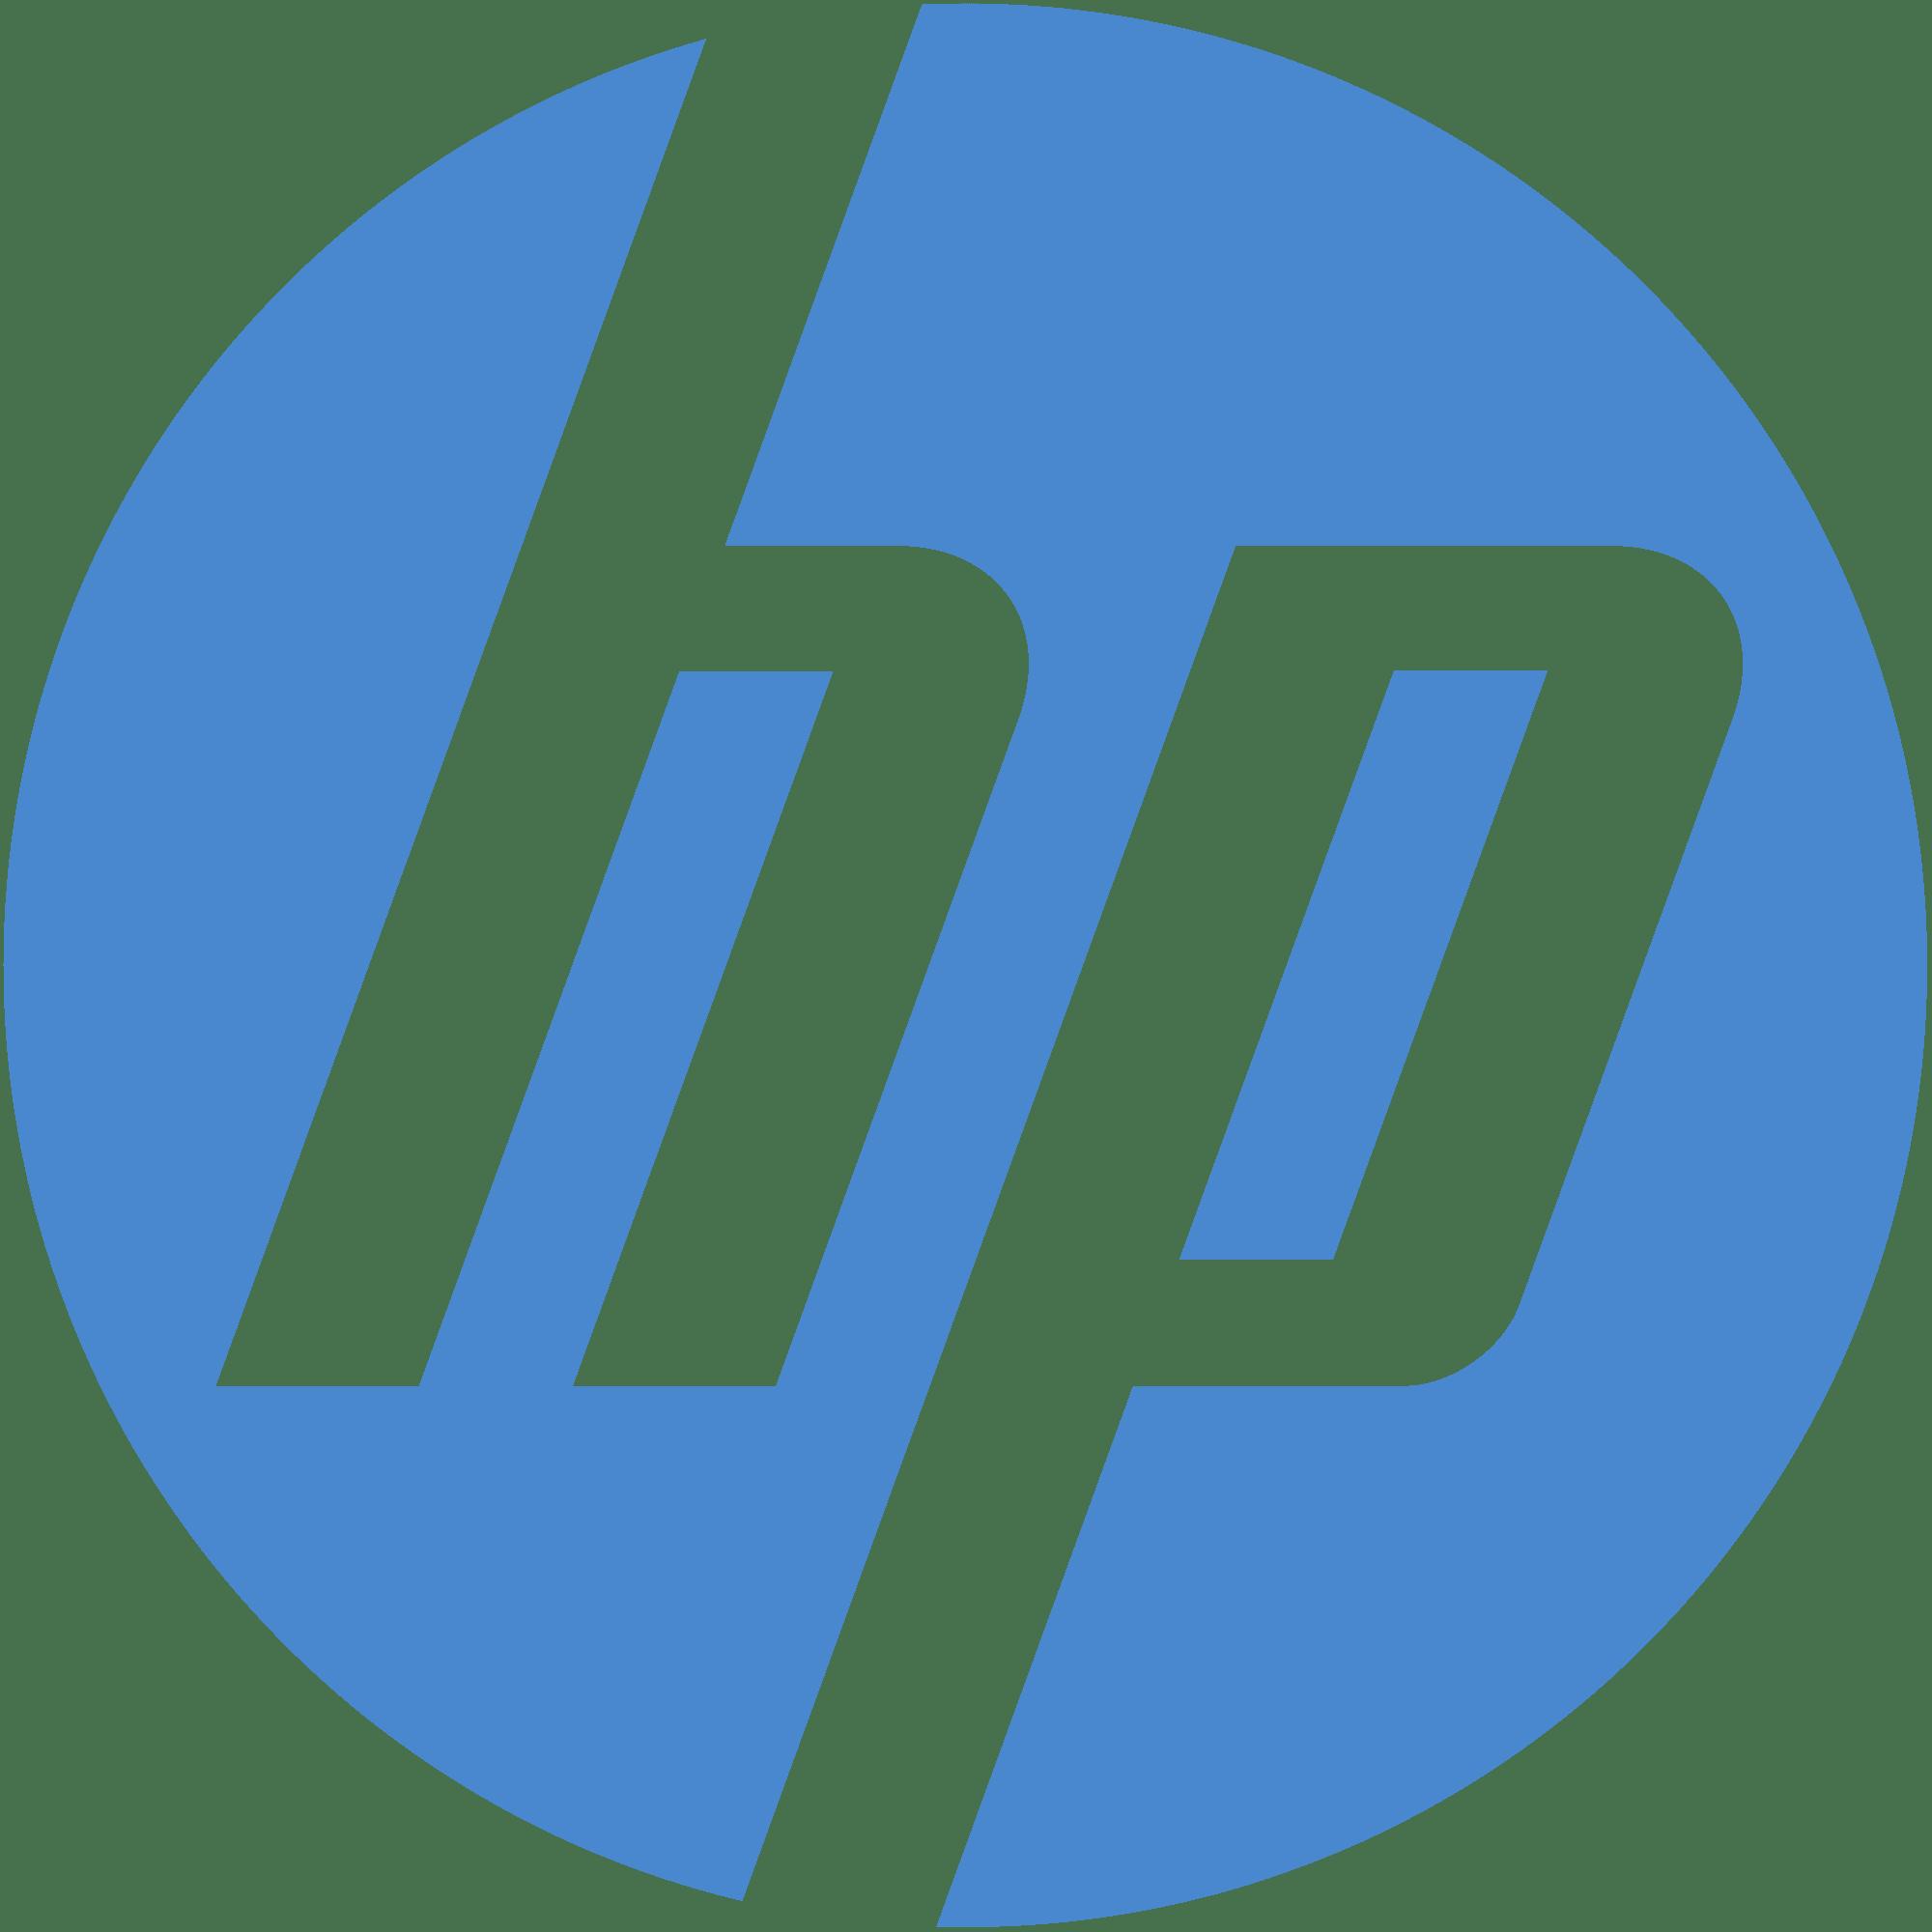 HP Officejet 6700 Premium Printer H711 Driver